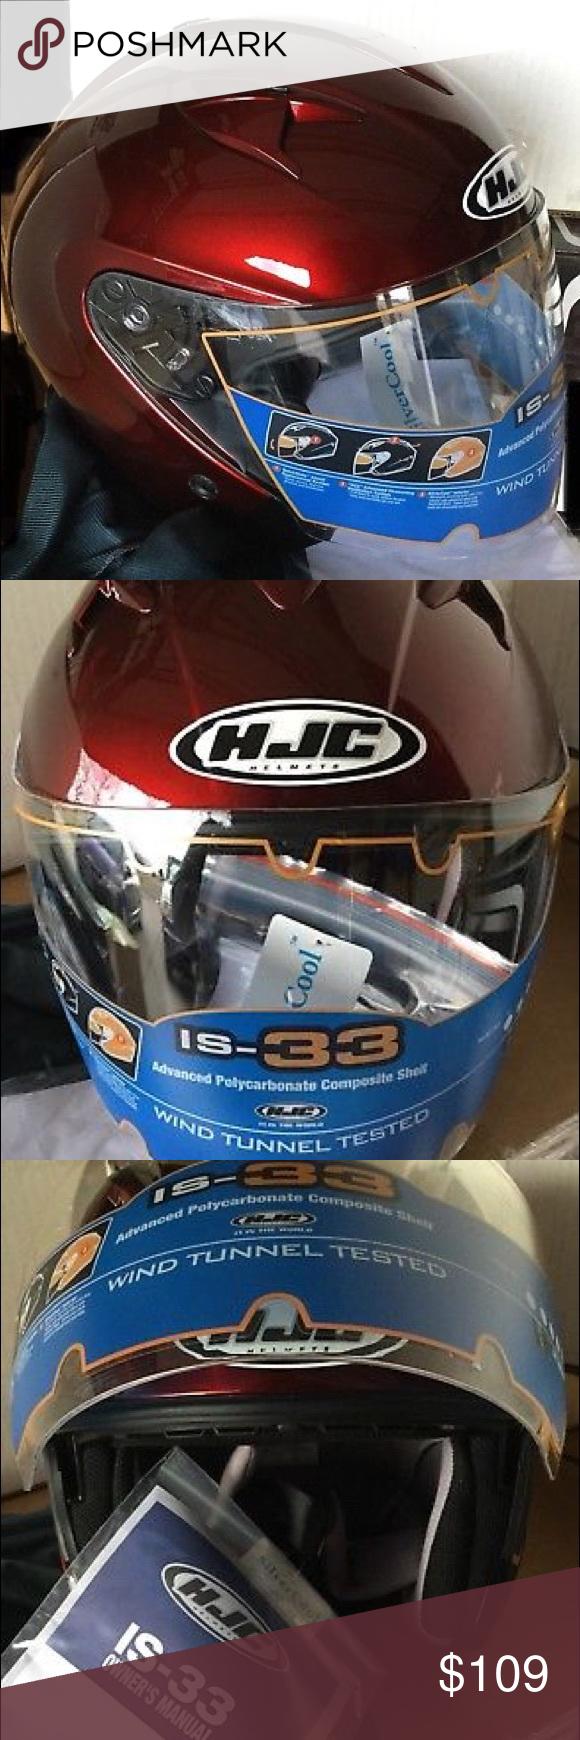 2X WINE IS33 OPENFACE MOTORCYCLE HELMET HJC Boutique